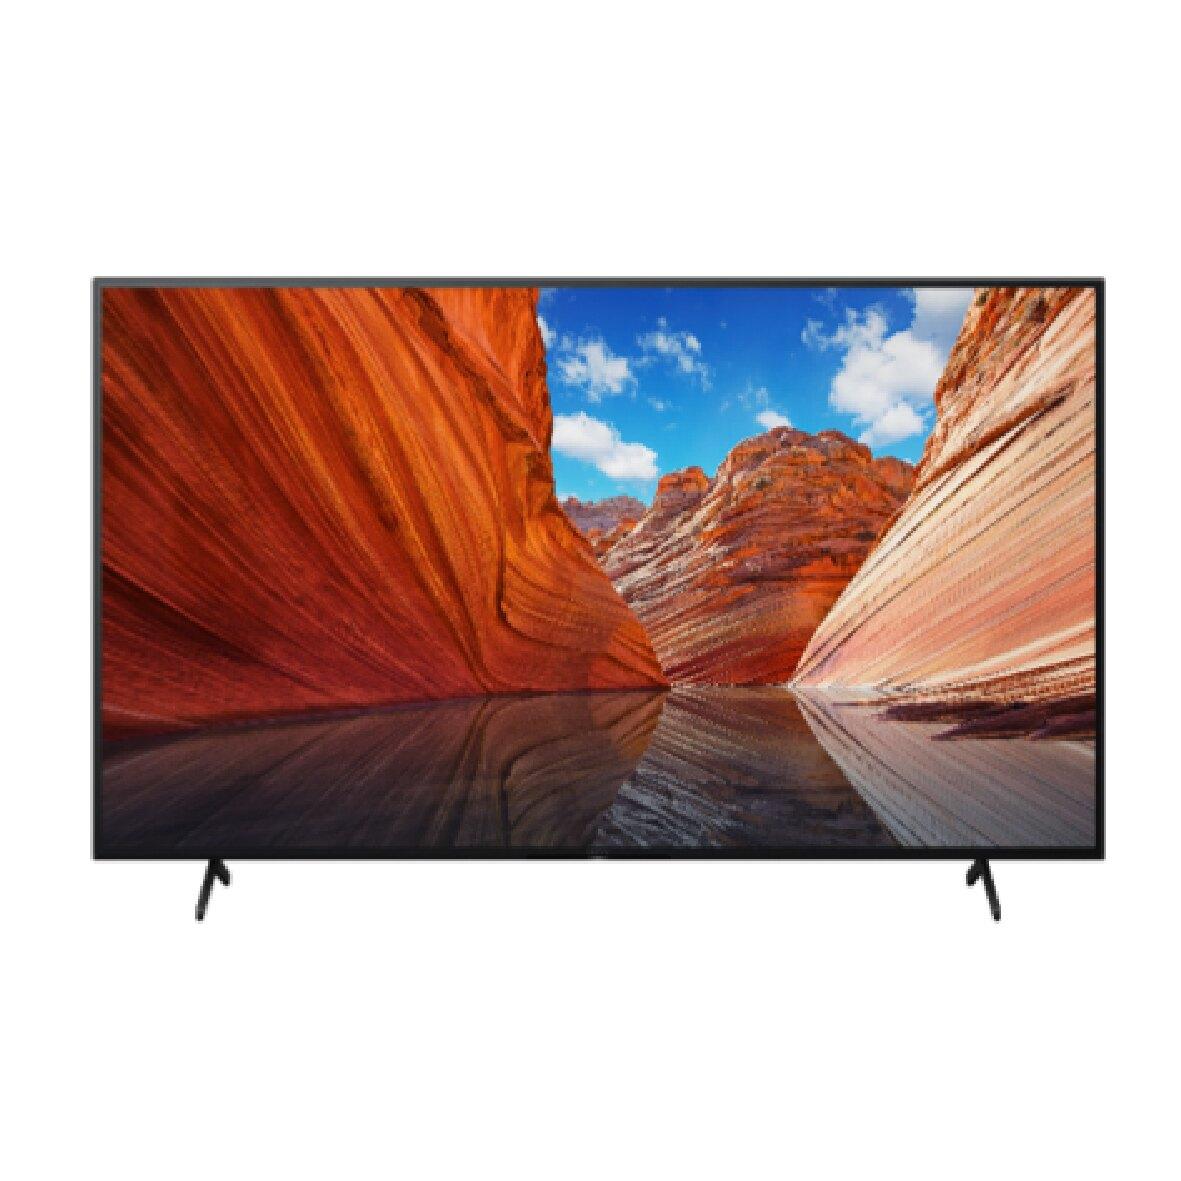 SONY 索尼 KM-43X80J 43吋 4K 超極真 HDR10 Google TV 電視 2021 | 金曲音響